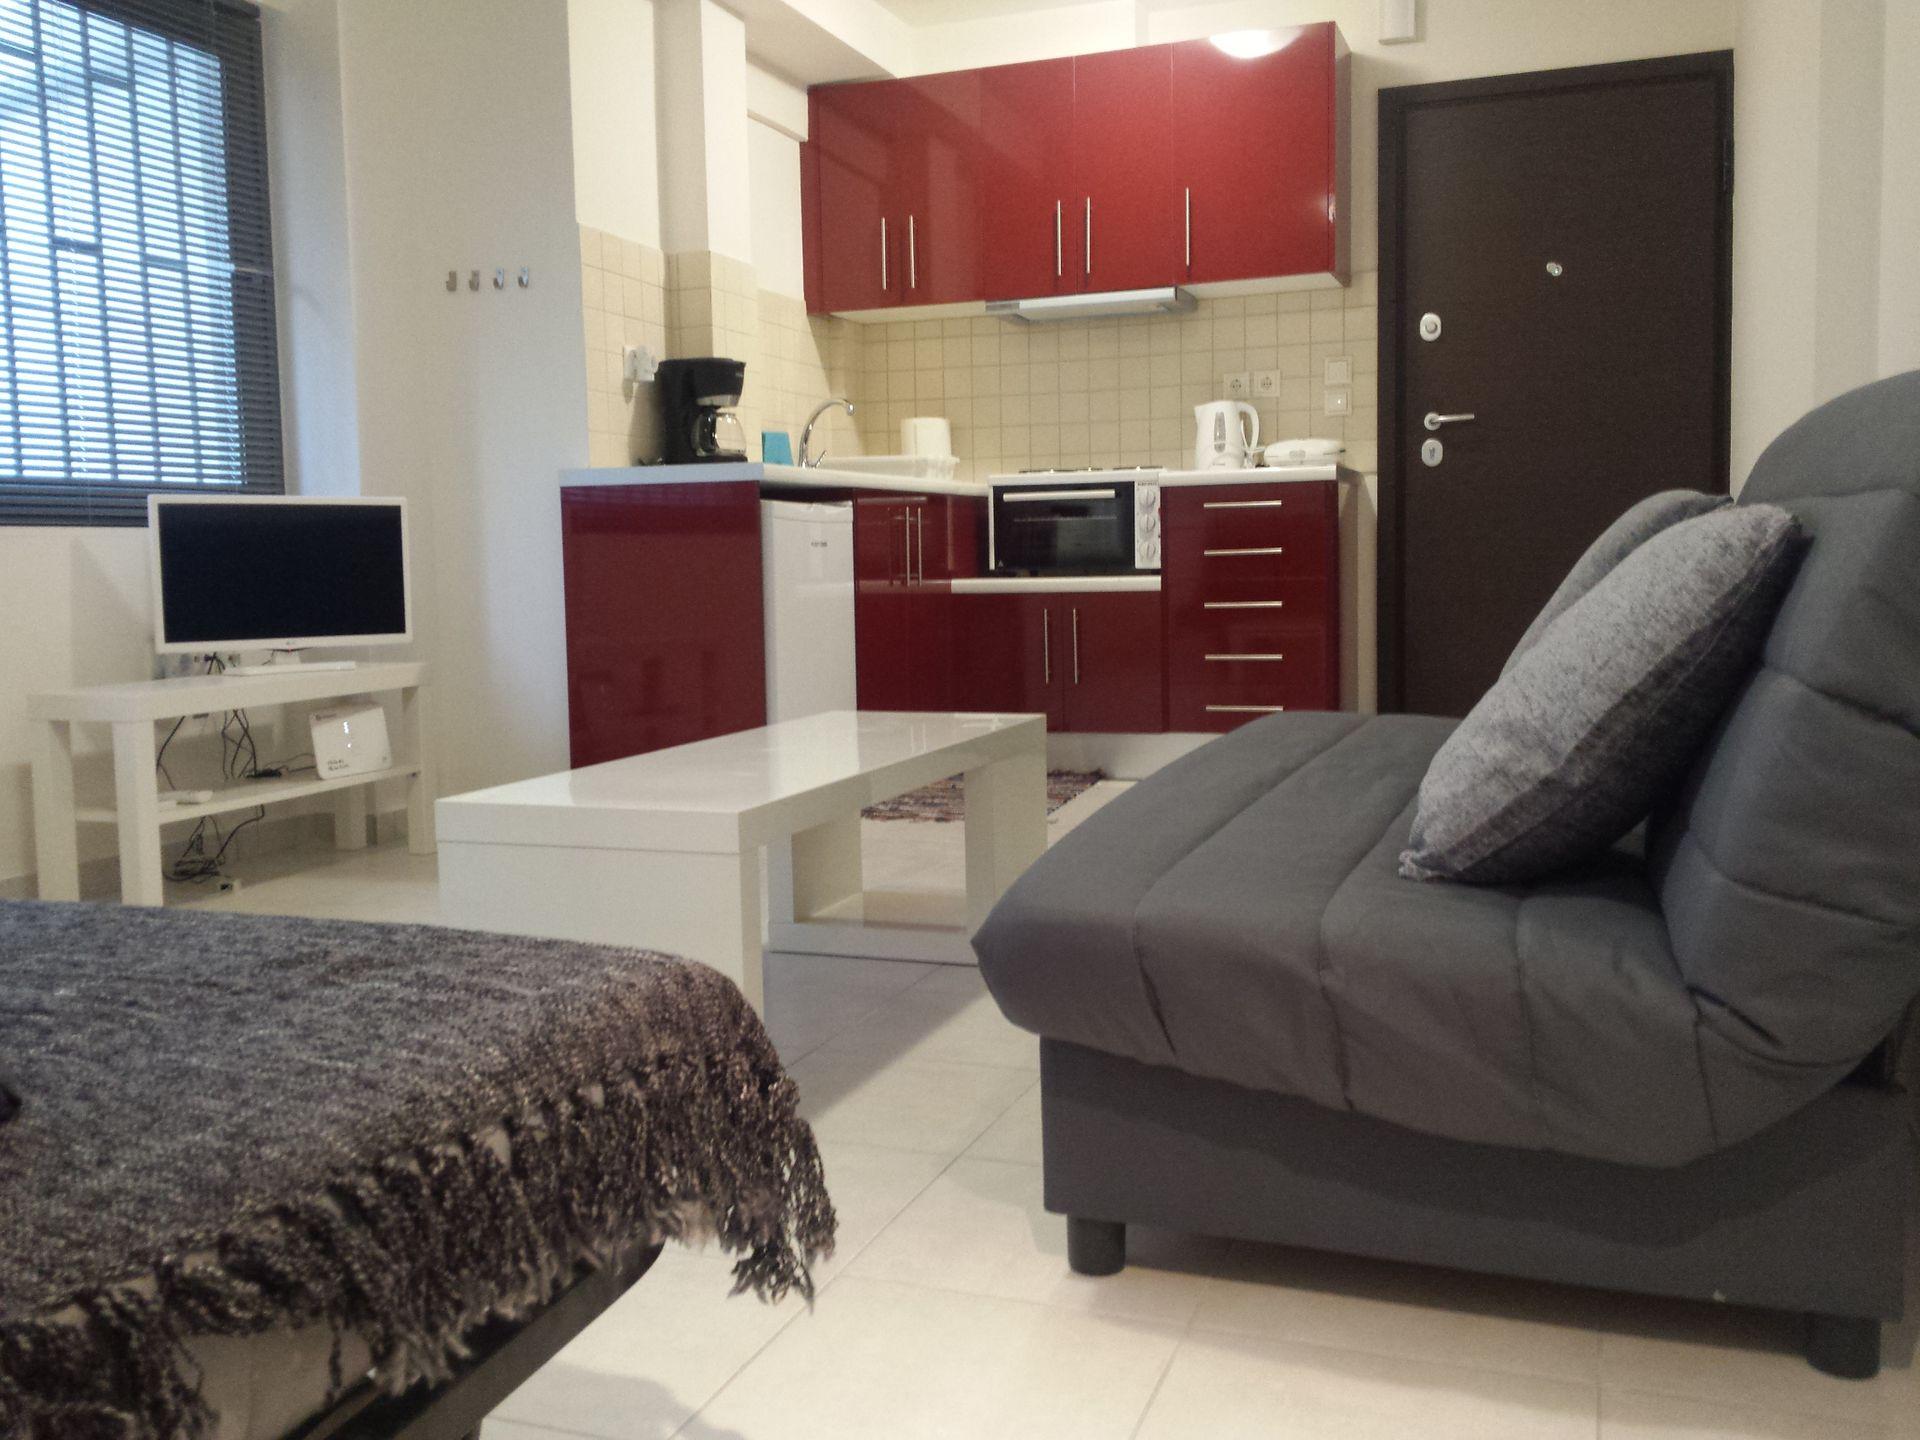 Elvita Apartments Athens - Αθήνα ✦ 3 Ημέρες (2 Διανυκτερεύσεις) ✦ 2 άτομα ✦ Χωρίς Πρωινό ✦ έως 31/12/2020 ✦ Free WiFi